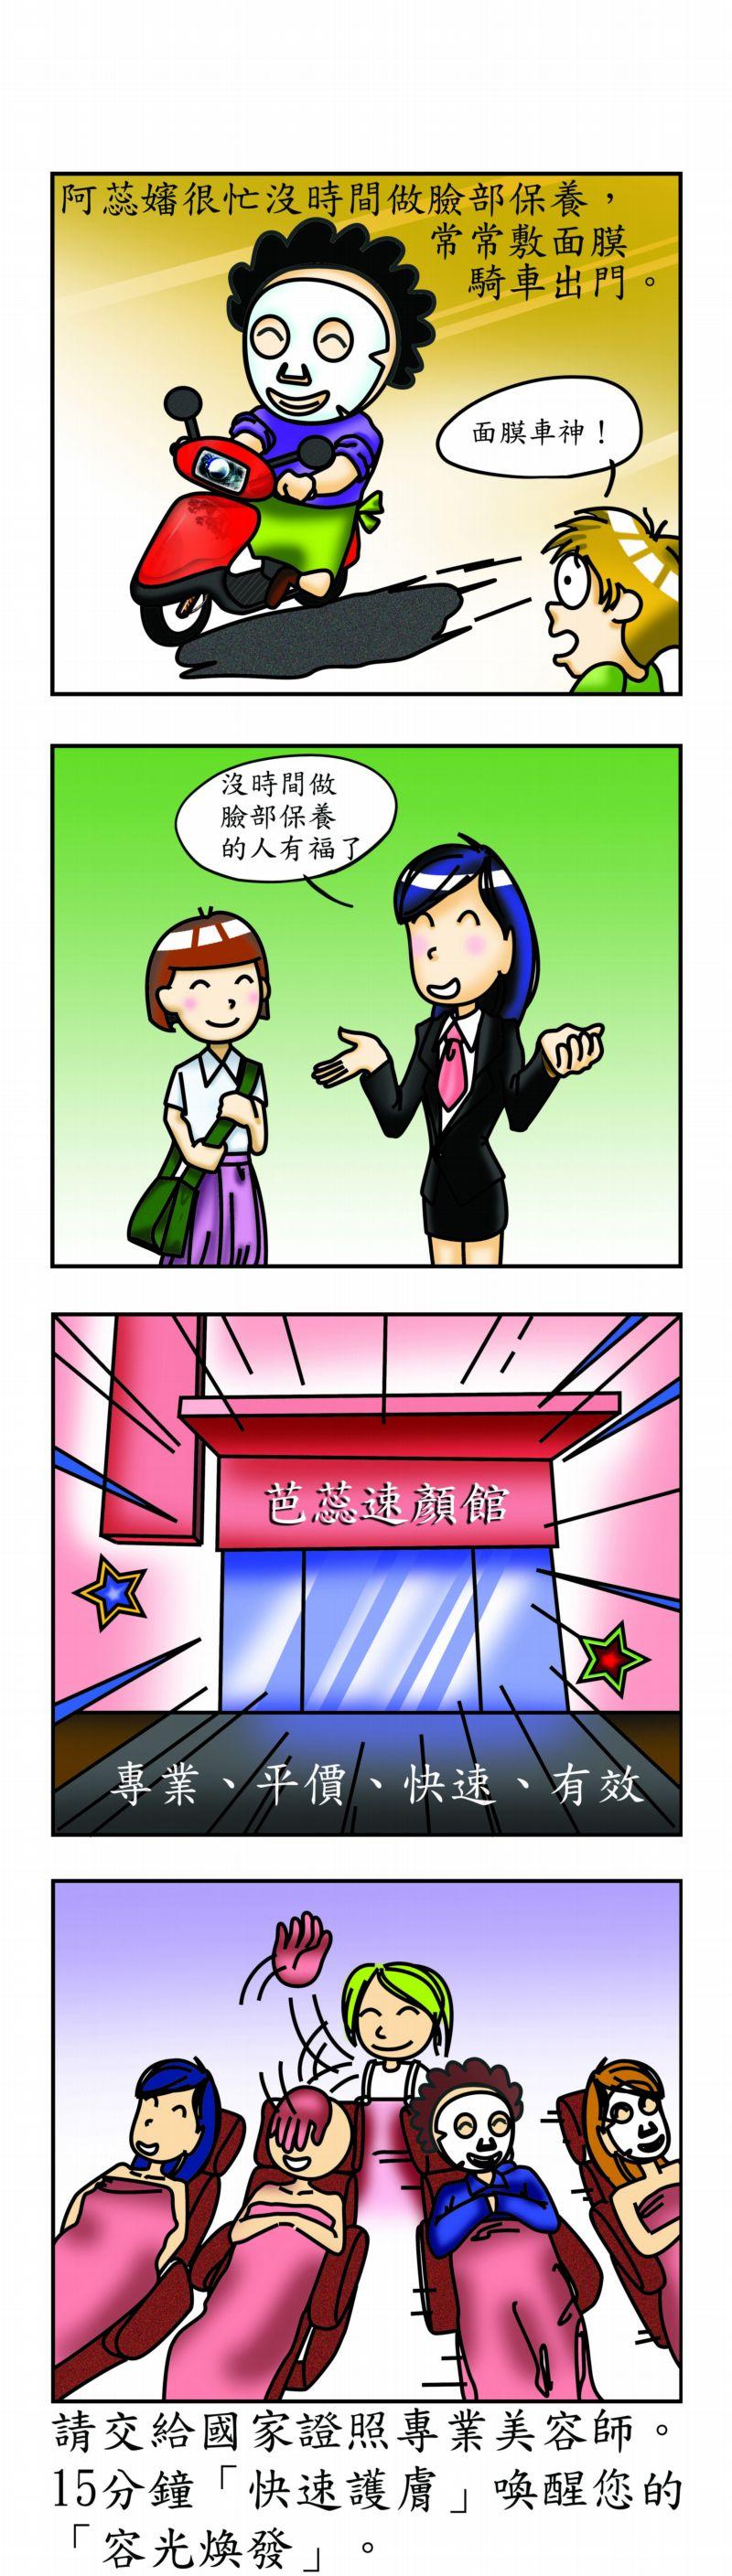 COMIC_01(面膜車神).jpg